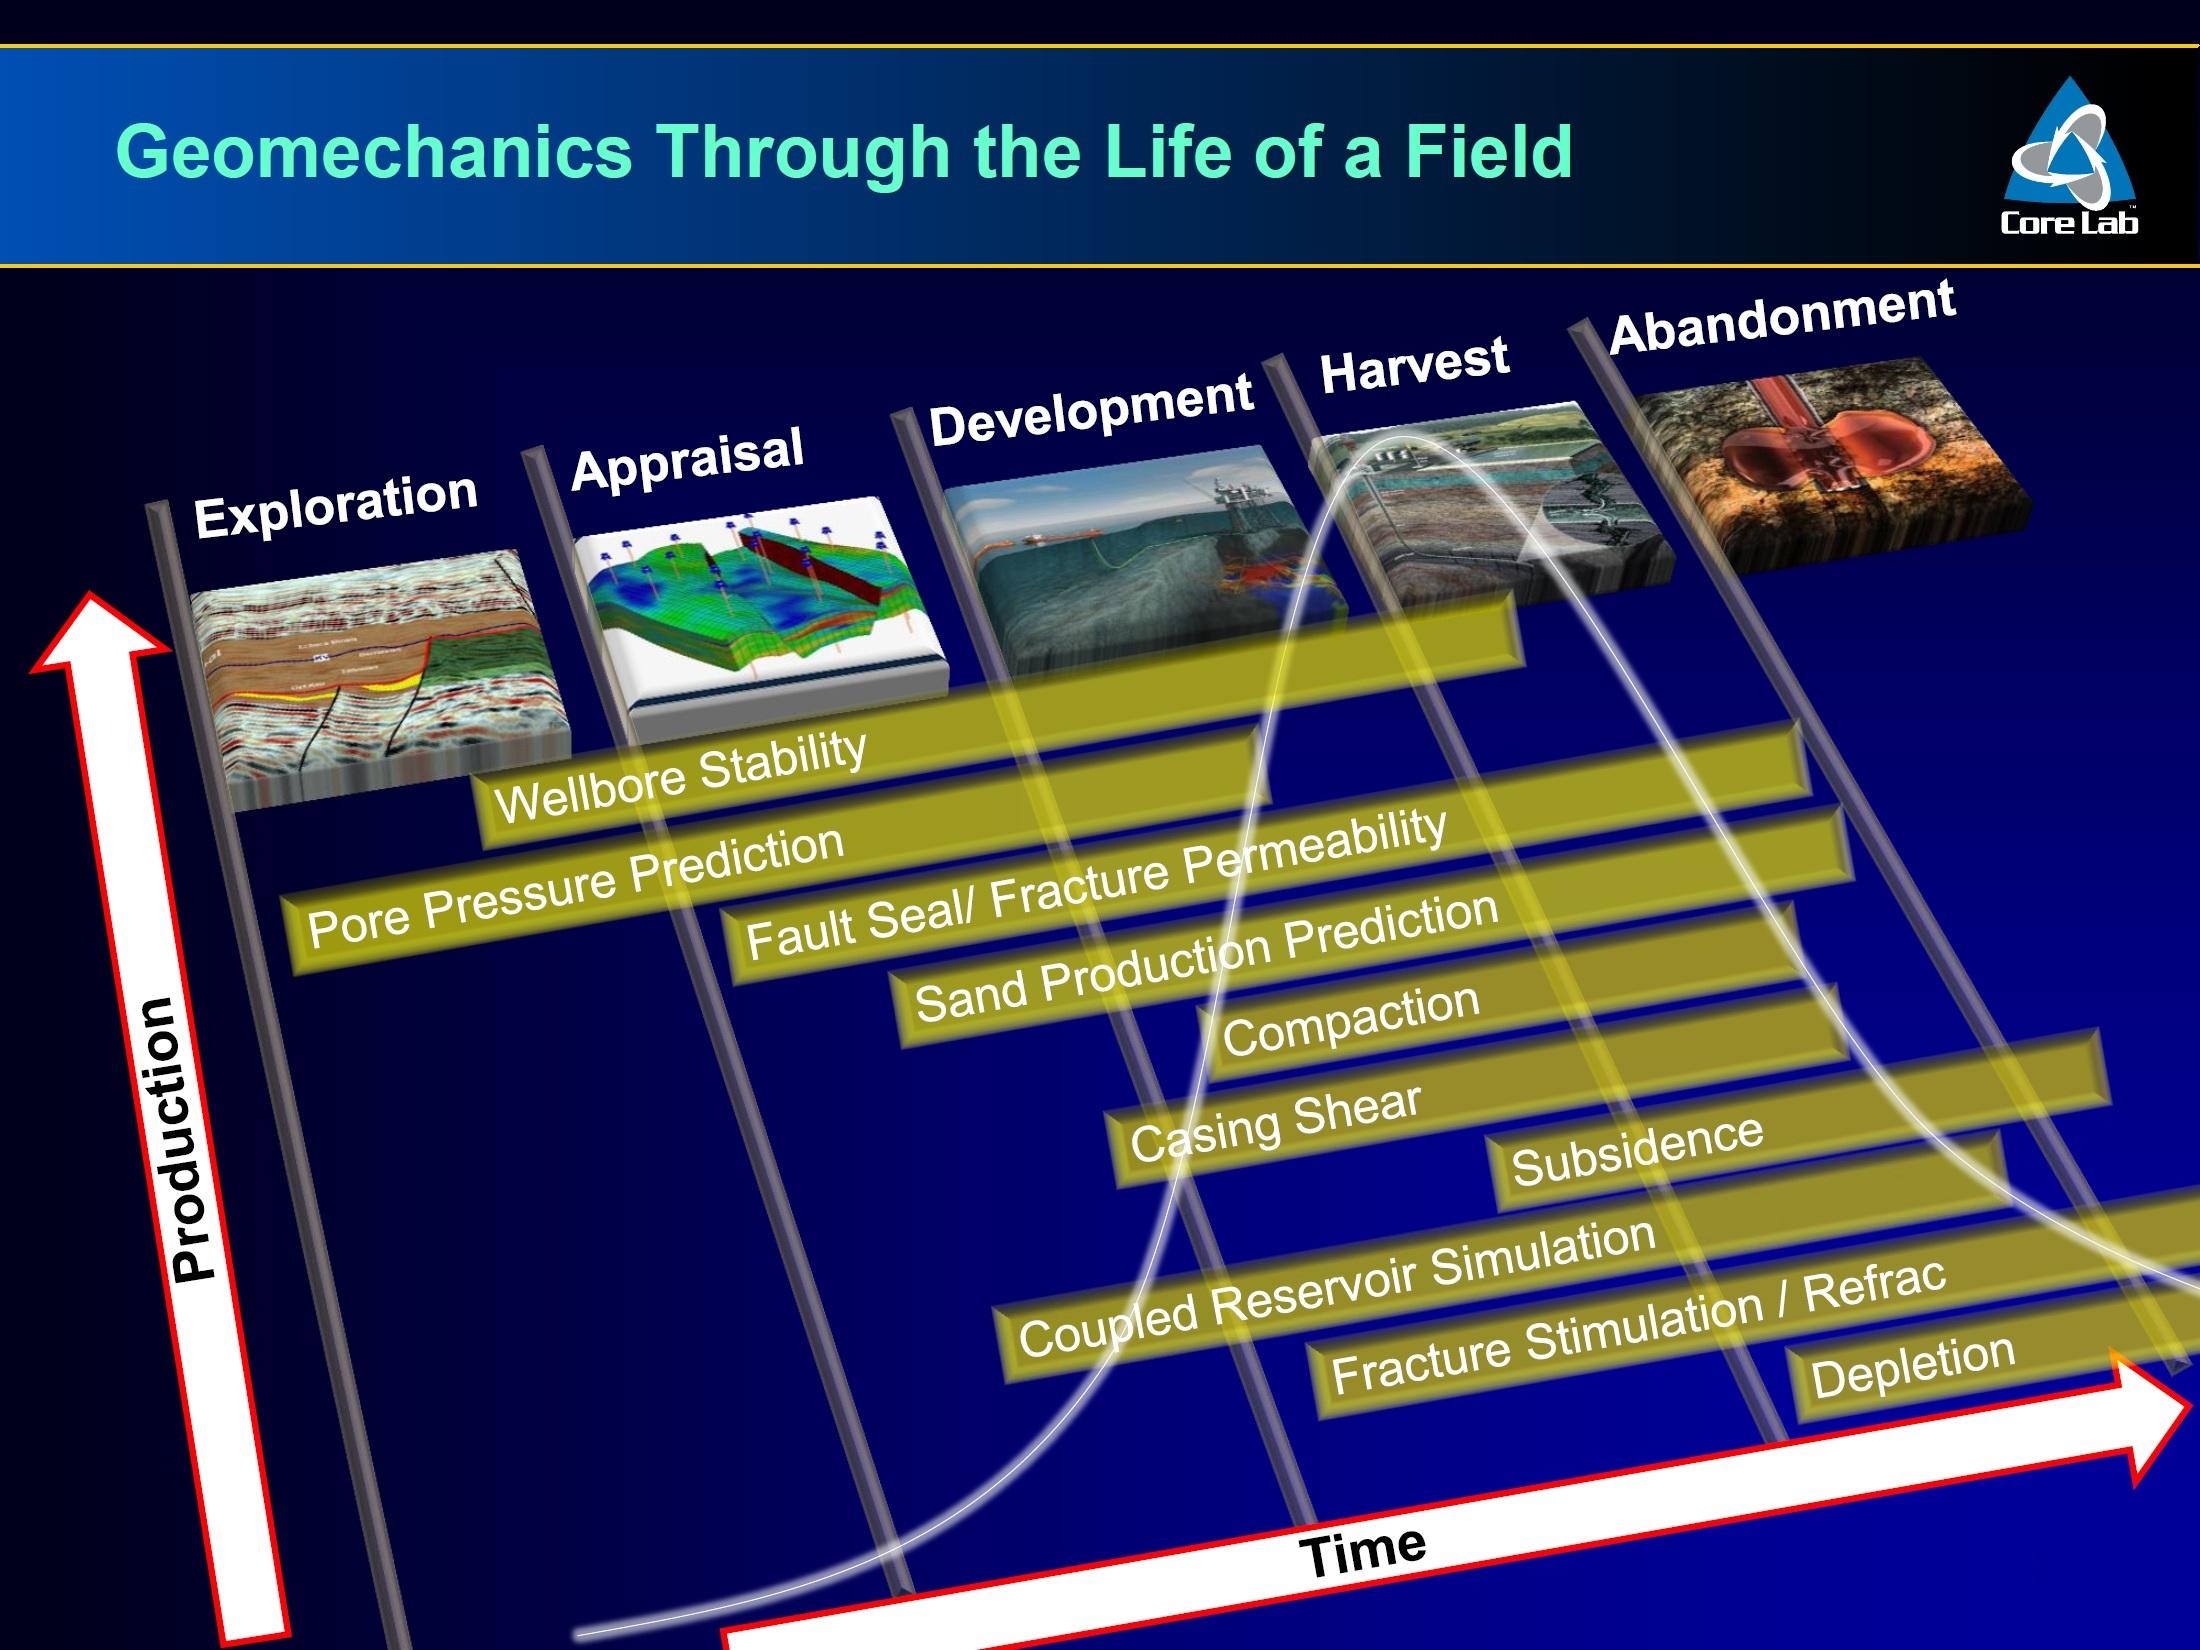 Igor Faoro Geomechanics Through the Life of a Field.jpg